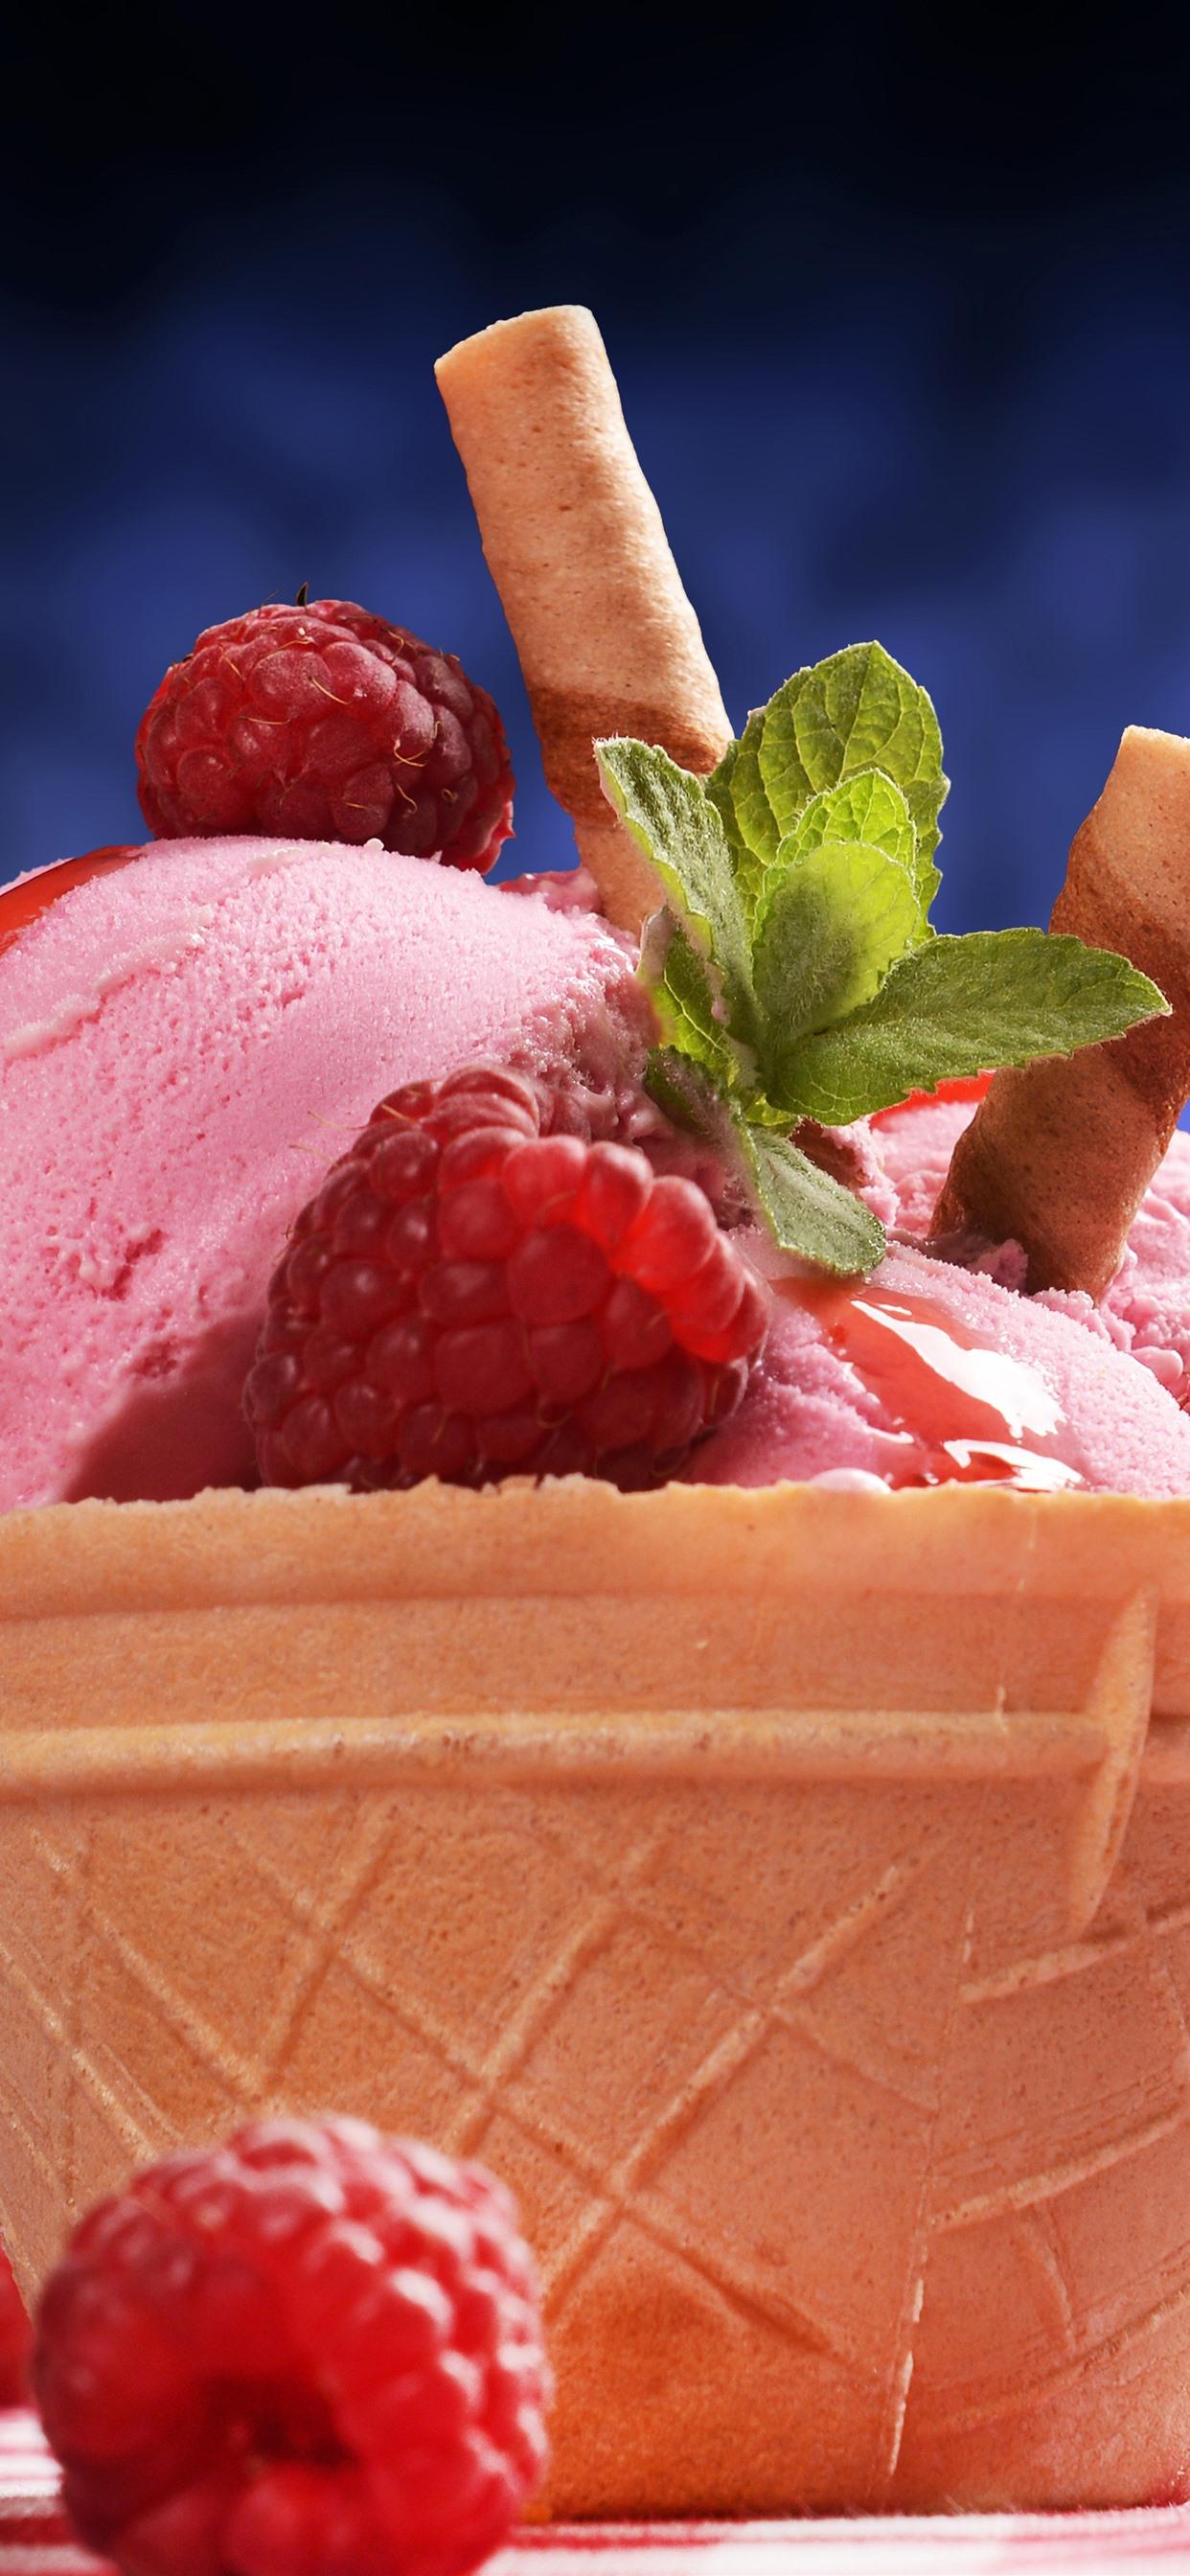 Pink Ice Cream Dessert Raspberry 1242x2688 Iphone Xs Max